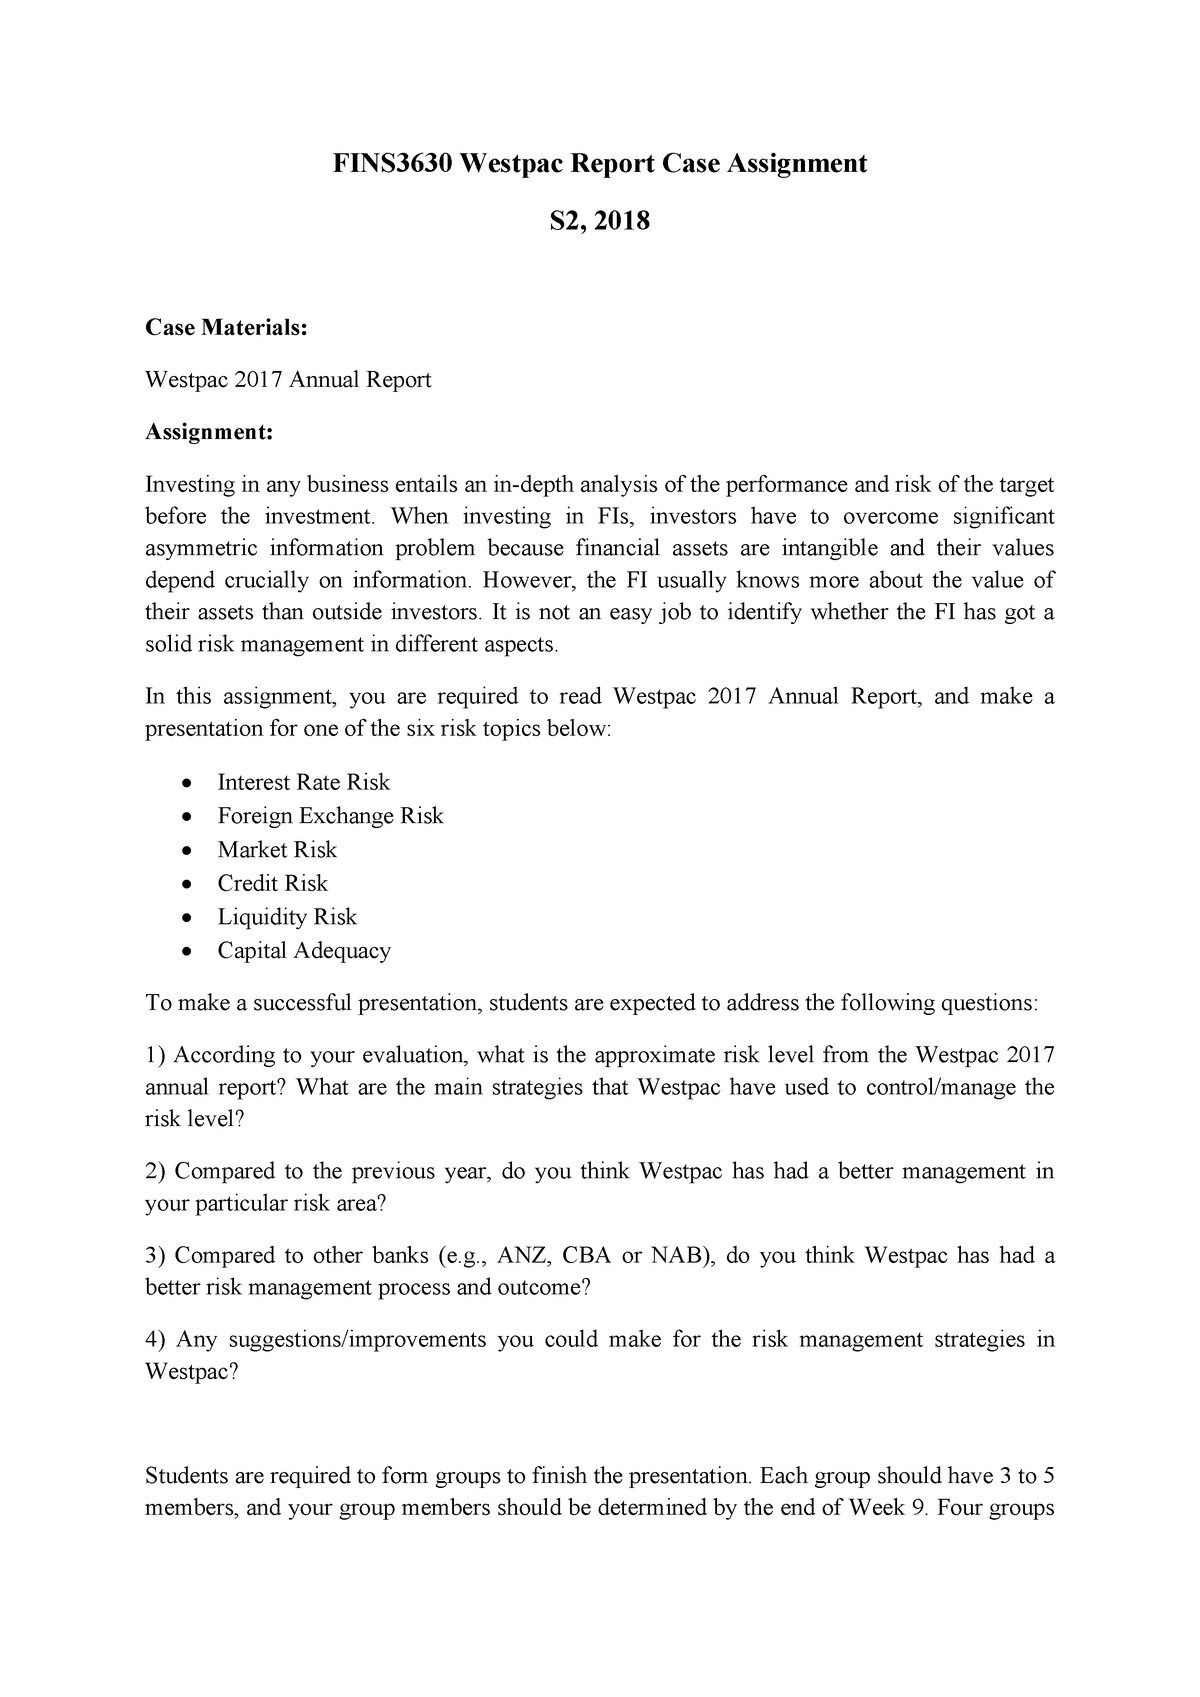 FINS3630 Case Project Presentation - FINS3630: Bank